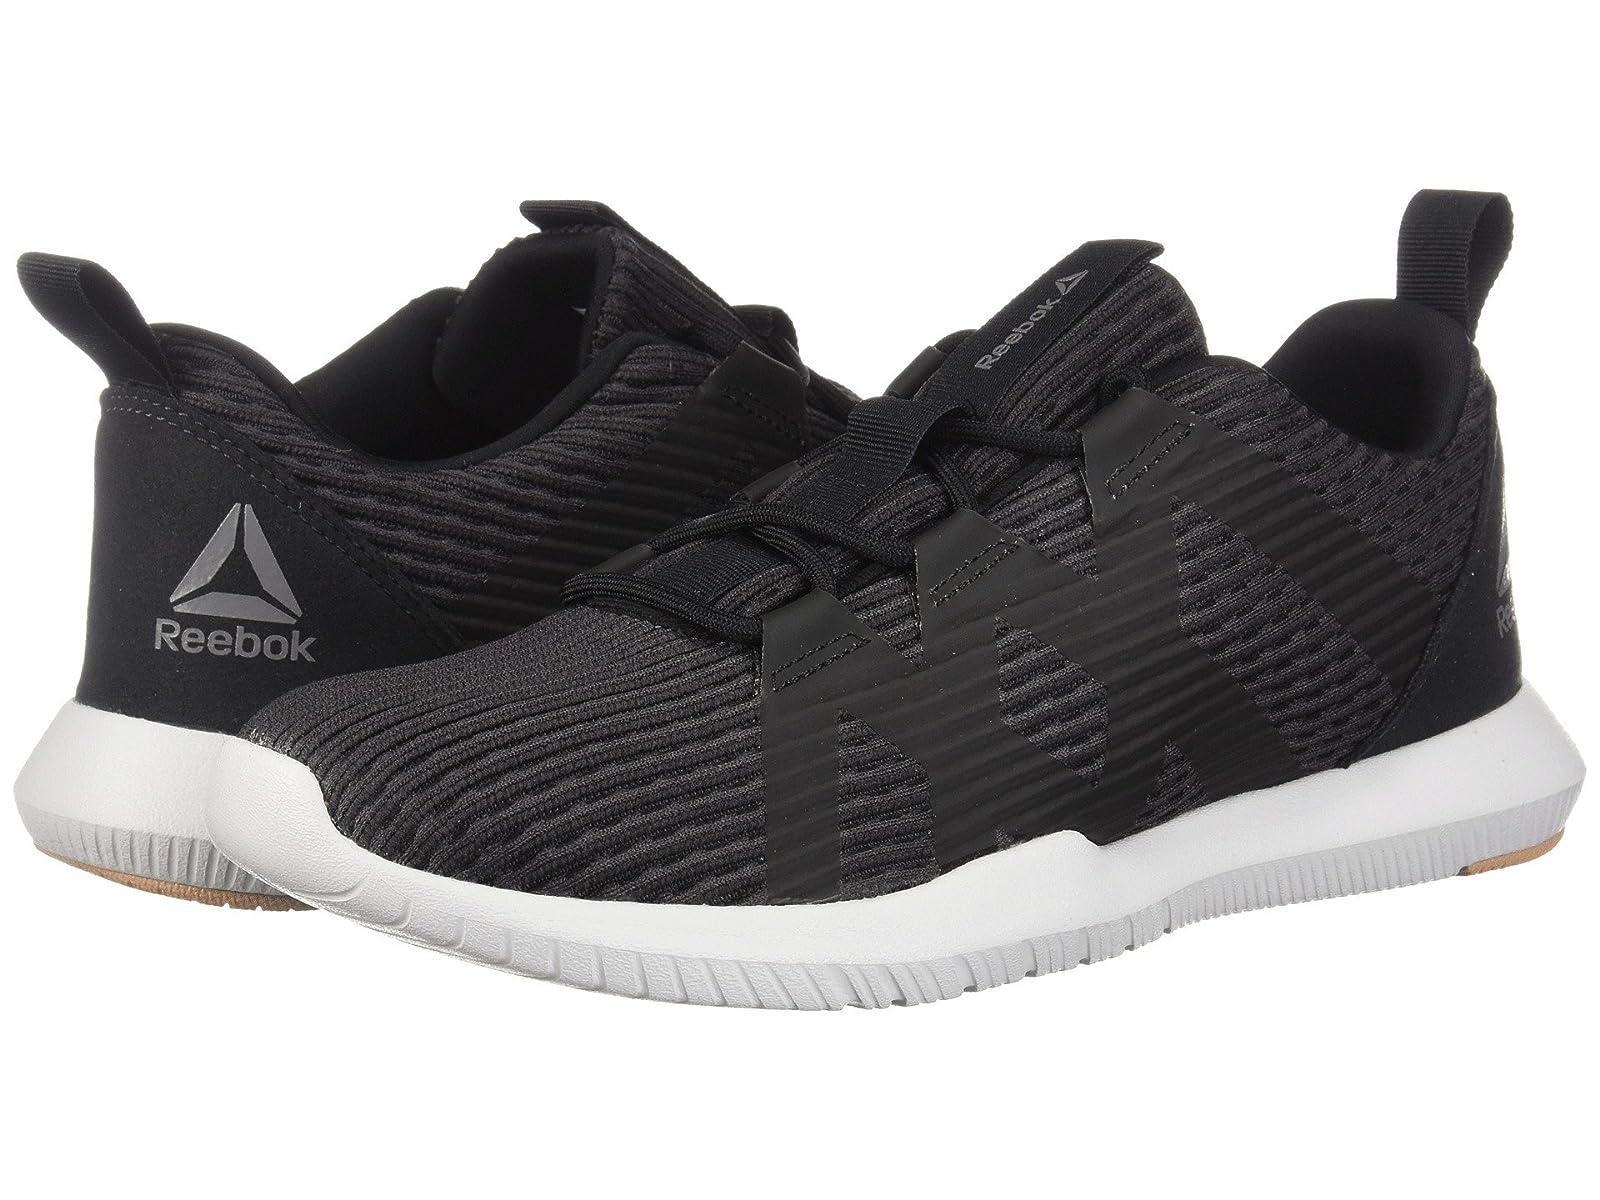 Reebok Reago PulseCheap and distinctive eye-catching shoes